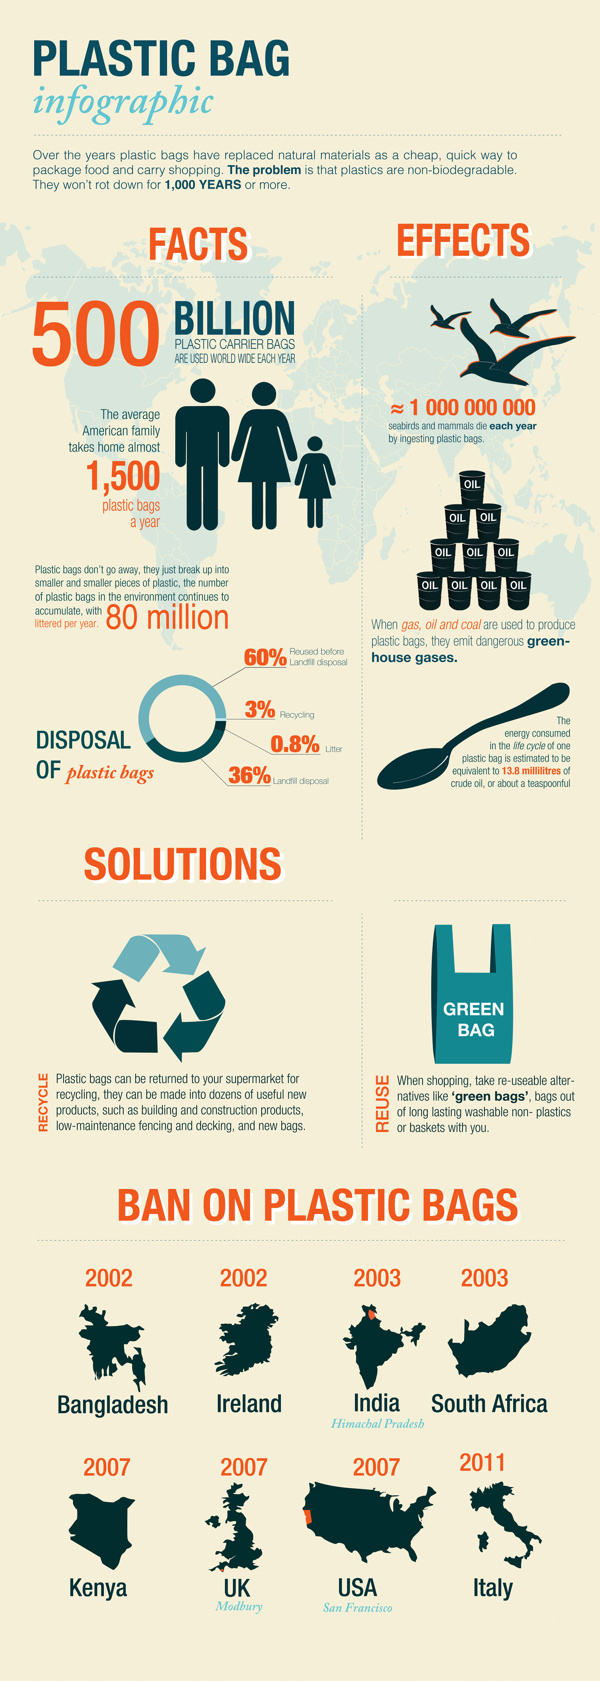 Plastic bag infographic #tako #chabukiani #infographic #go #bag #plastic #pollution #green